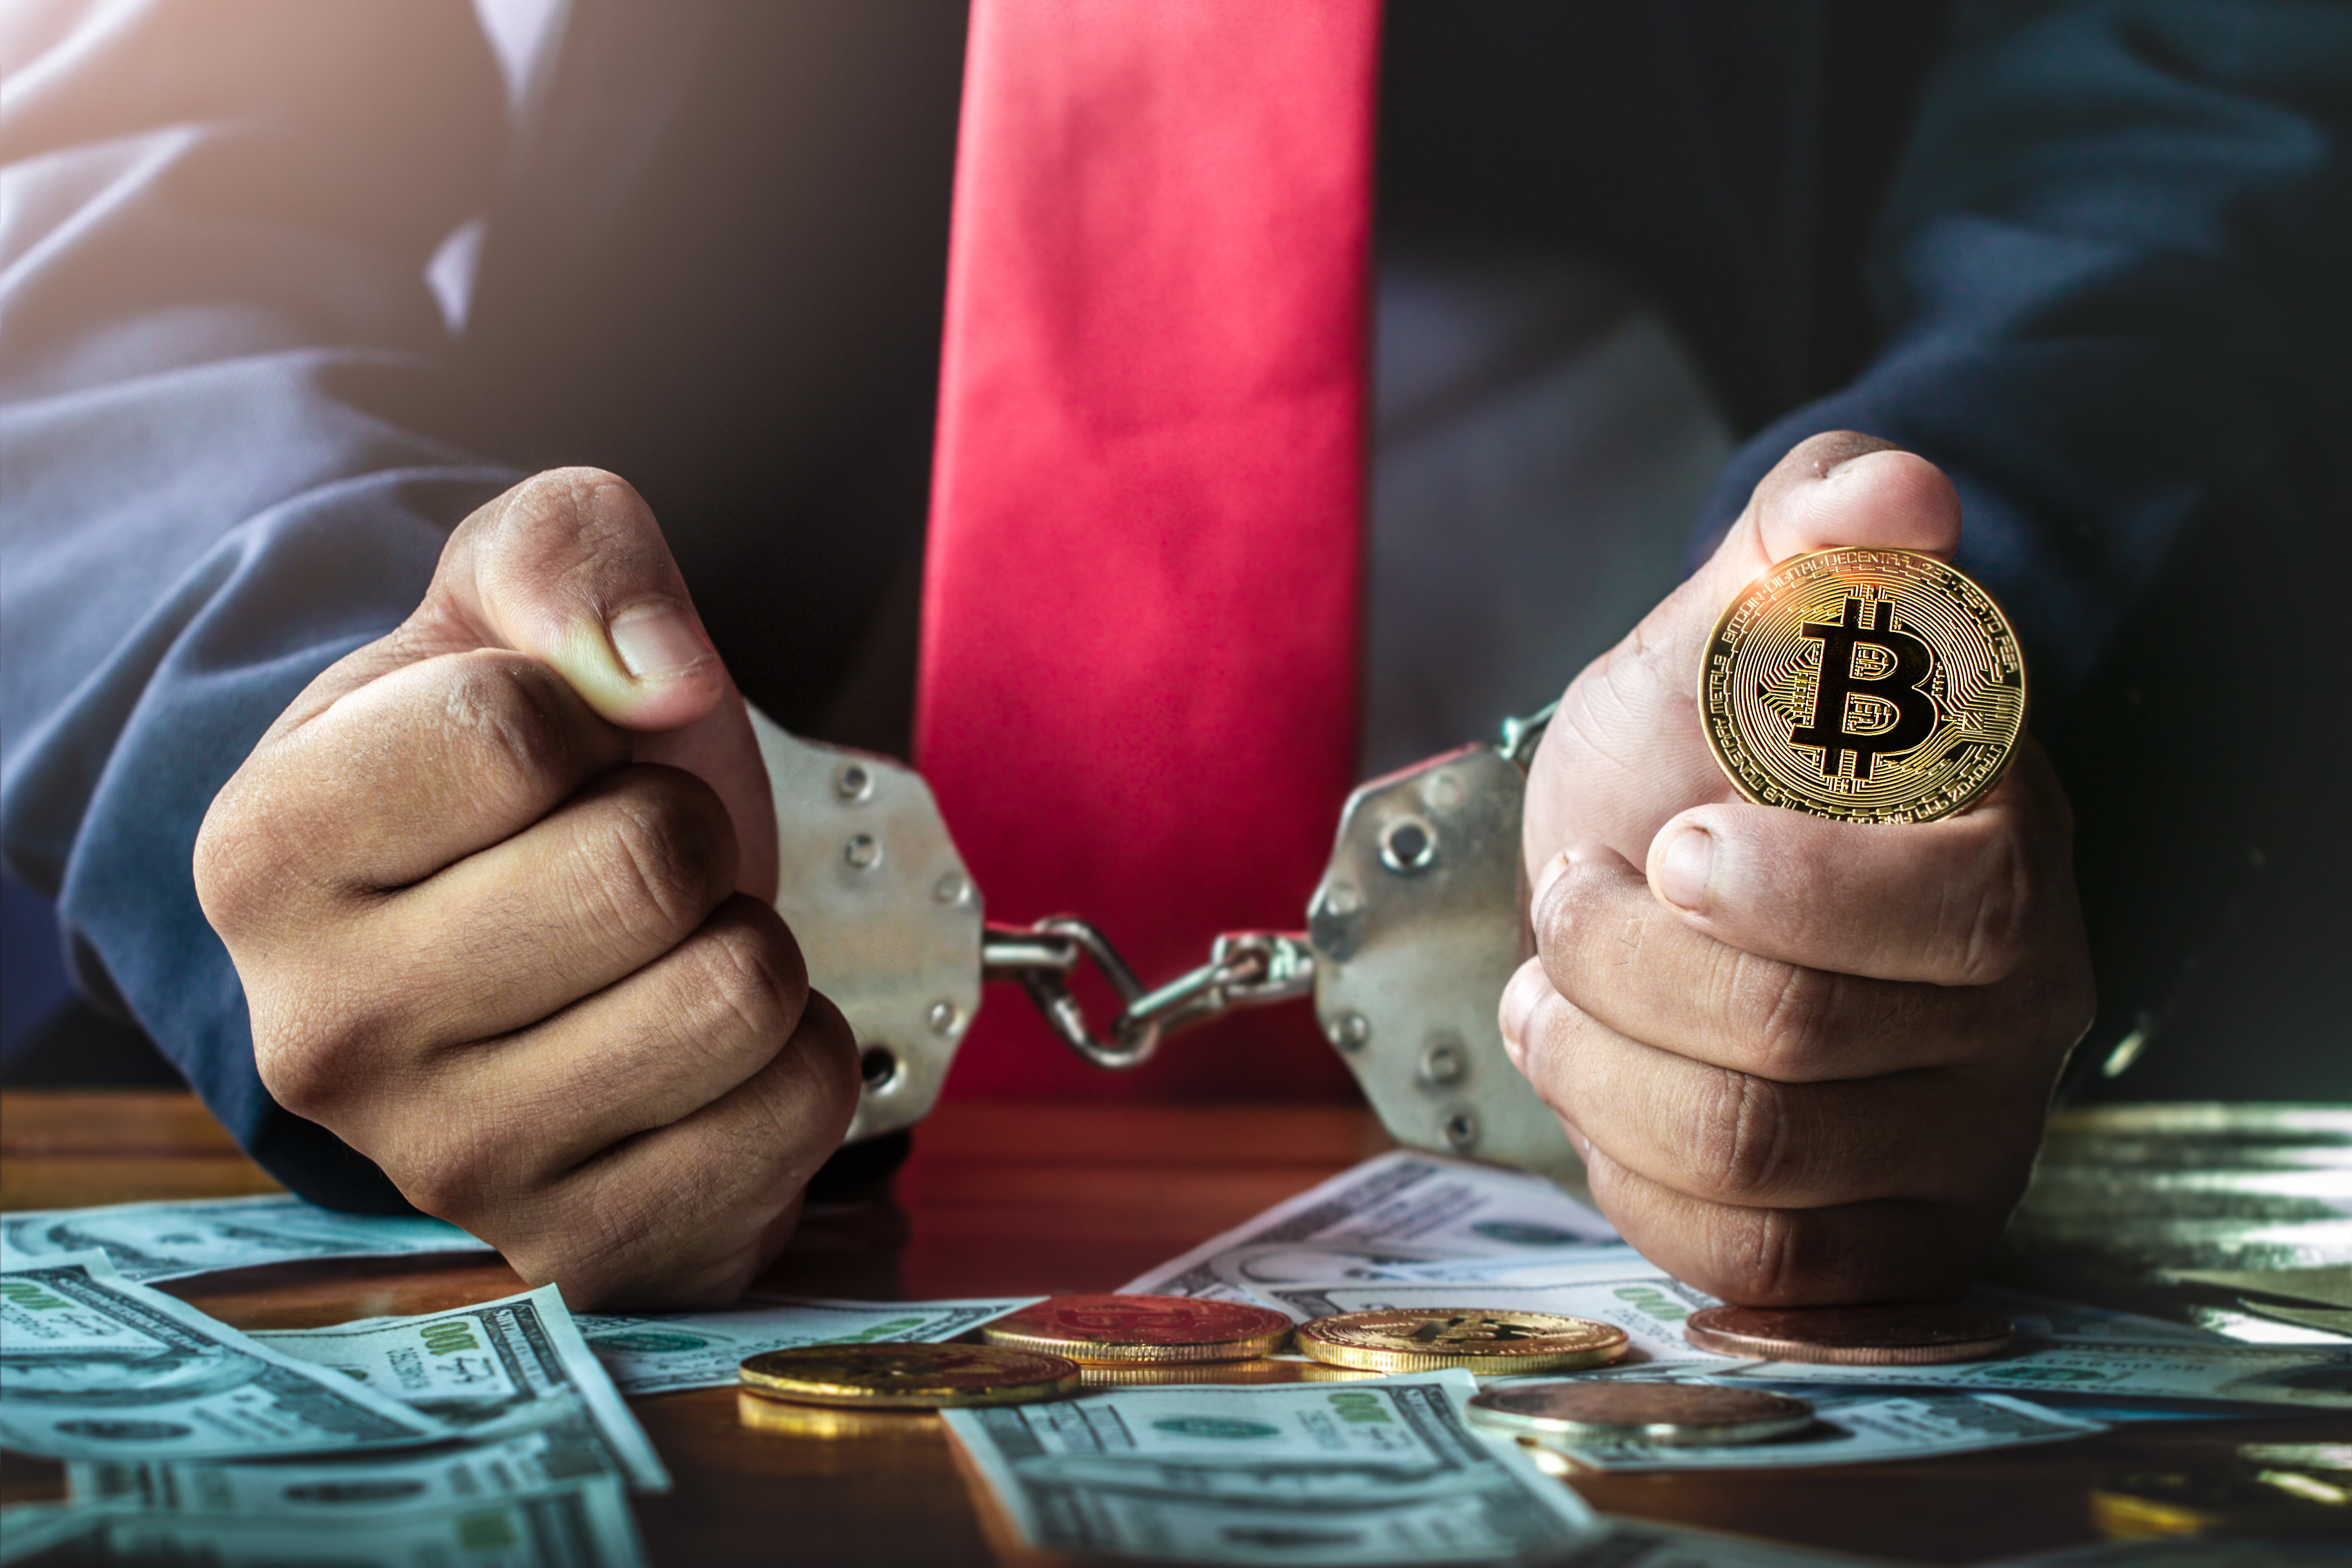 bitcoin mining farm china bitcoin miliardar glitch android